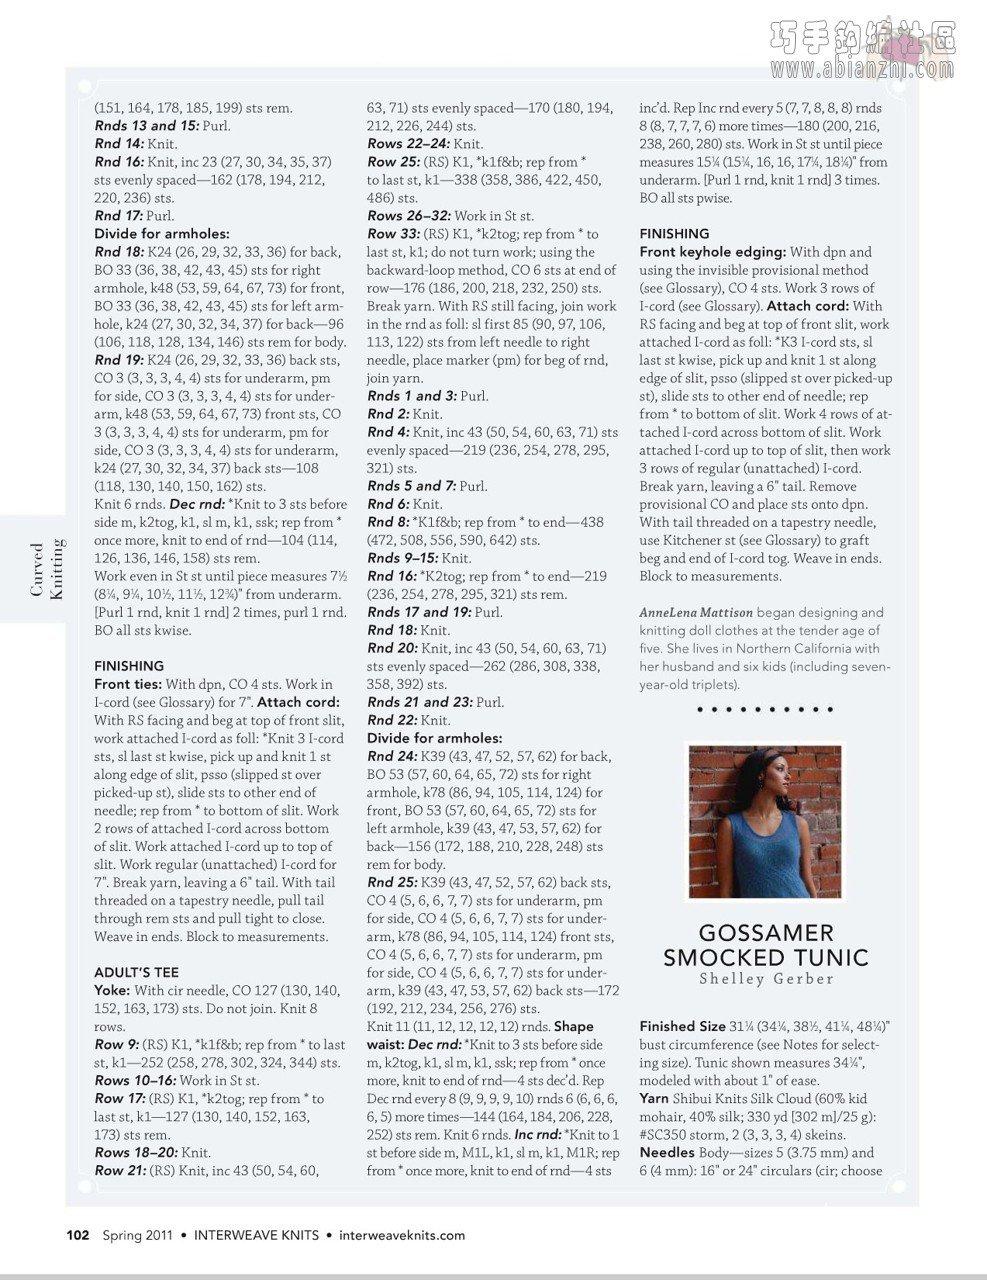 IWKSp11_page104_image1.jpg